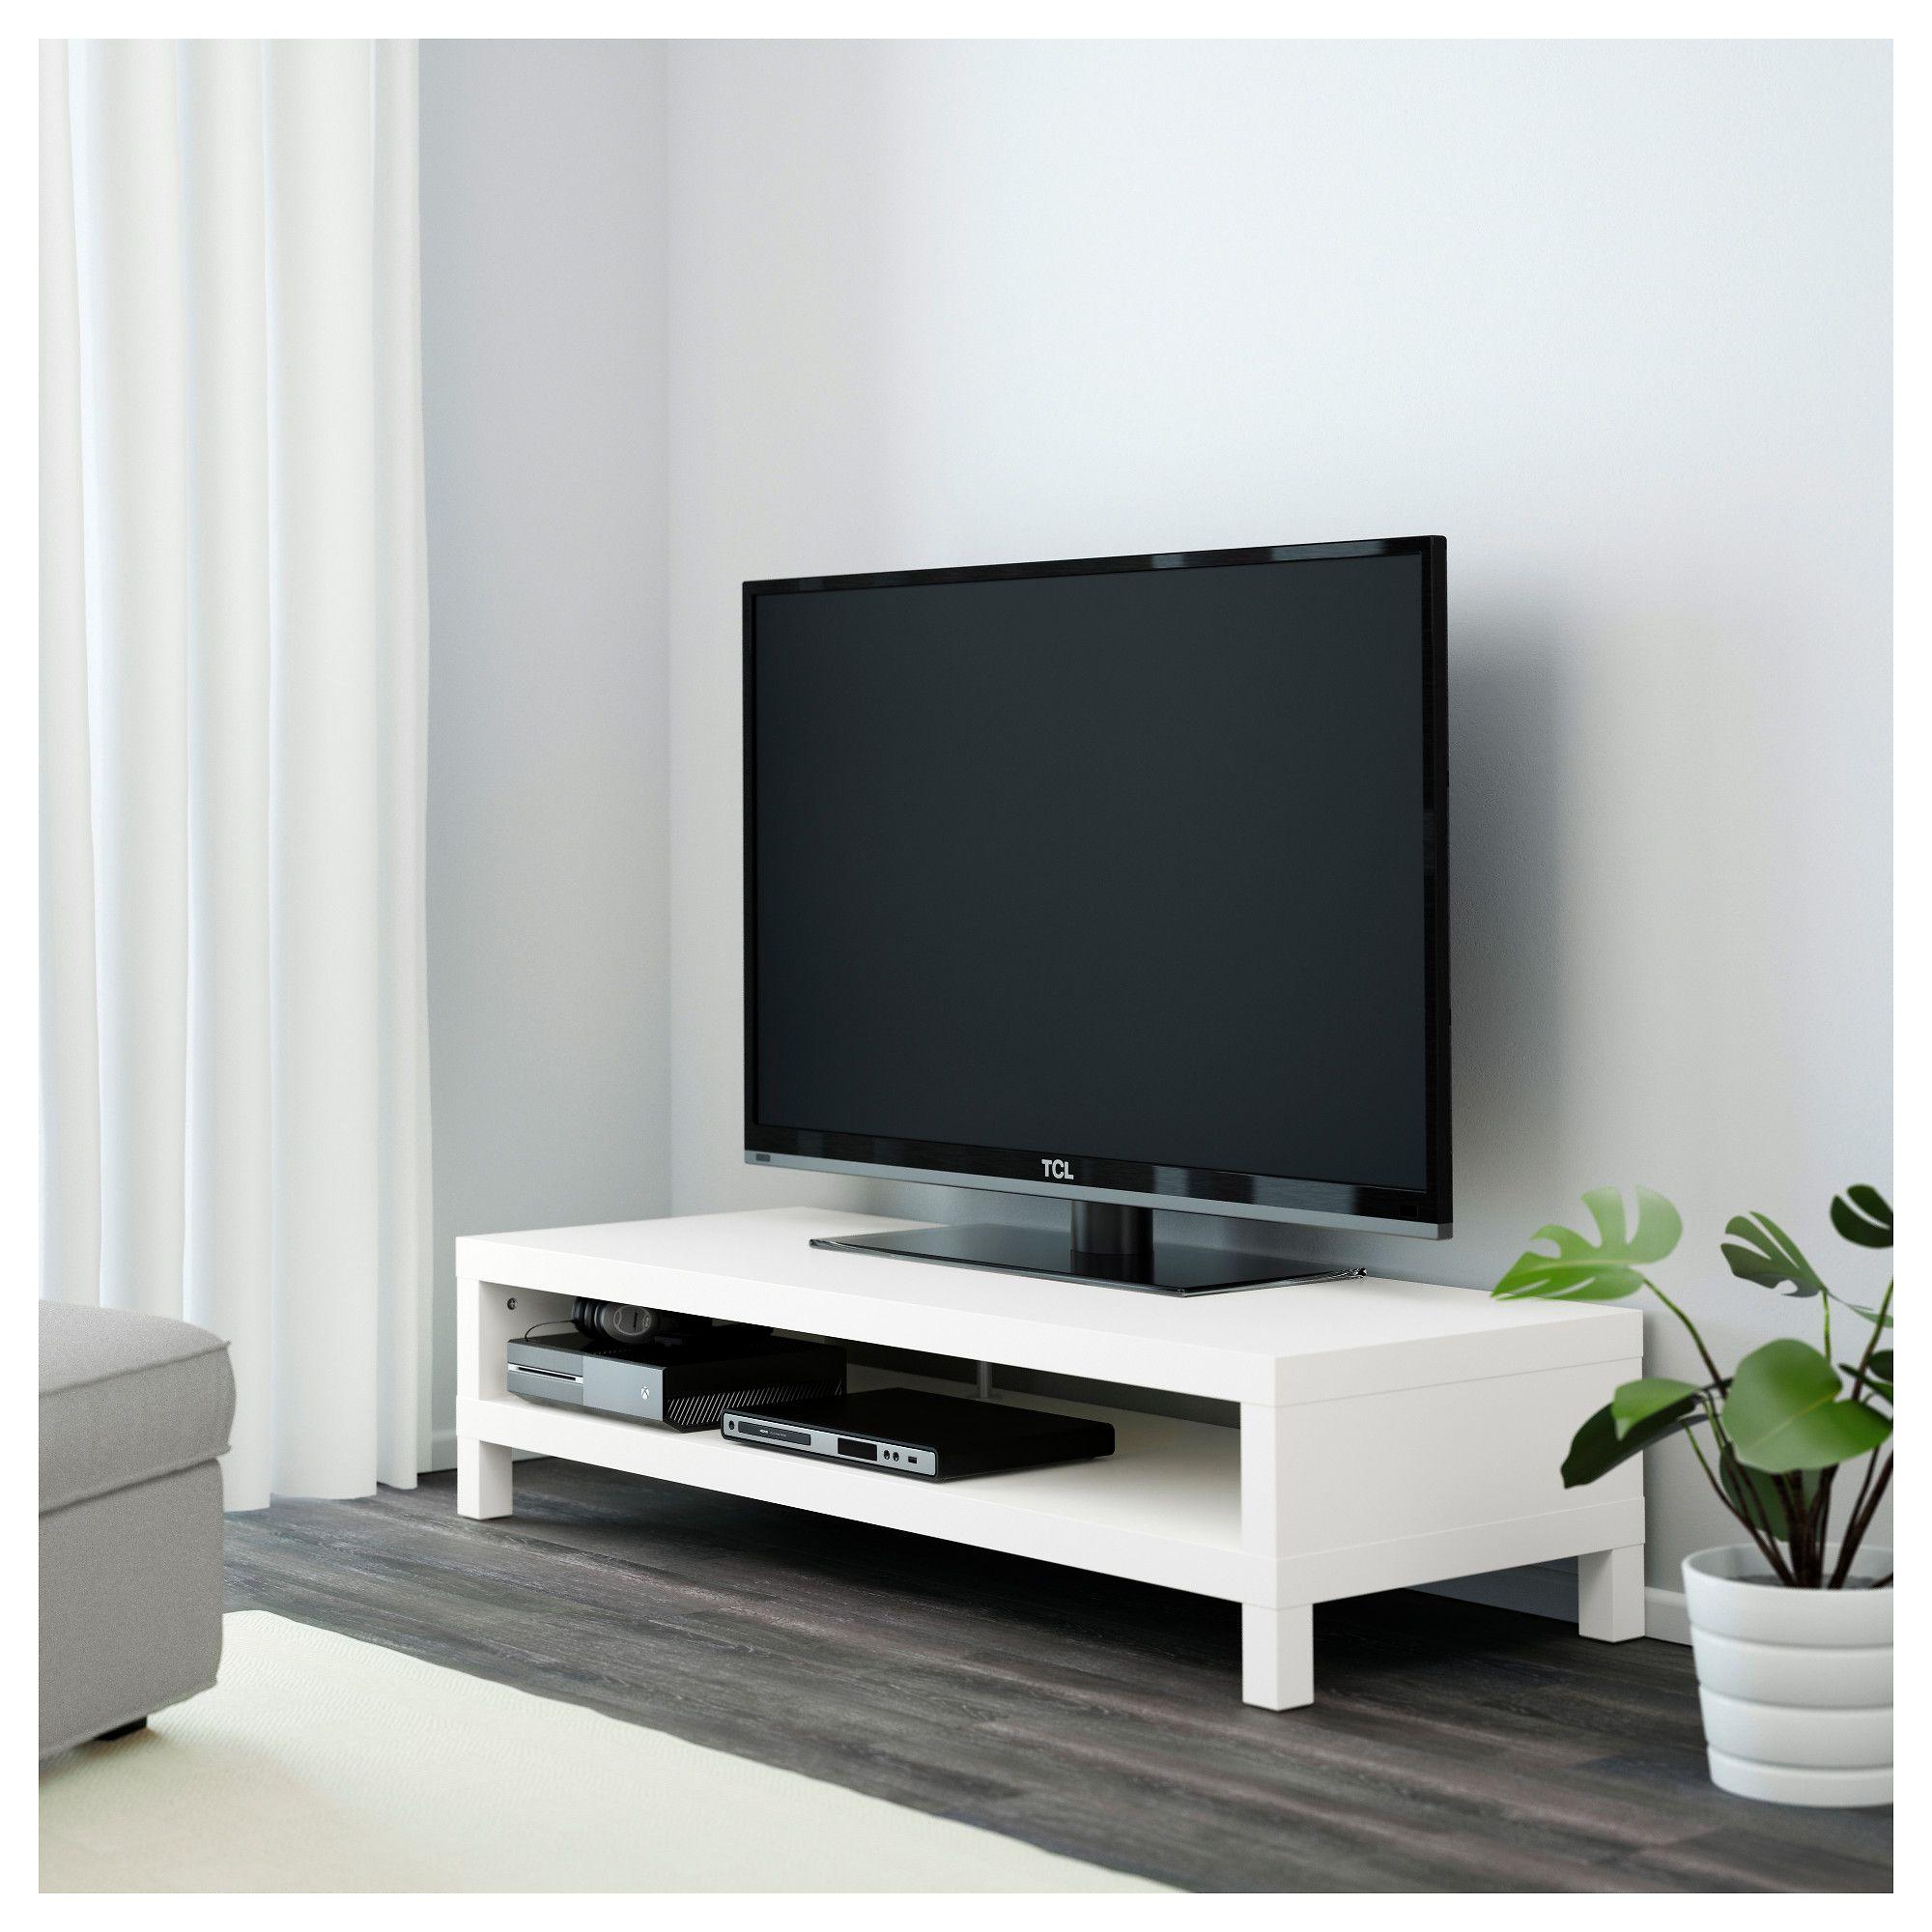 Ireland Shop For Furniture Home Accessories Con Imagenes